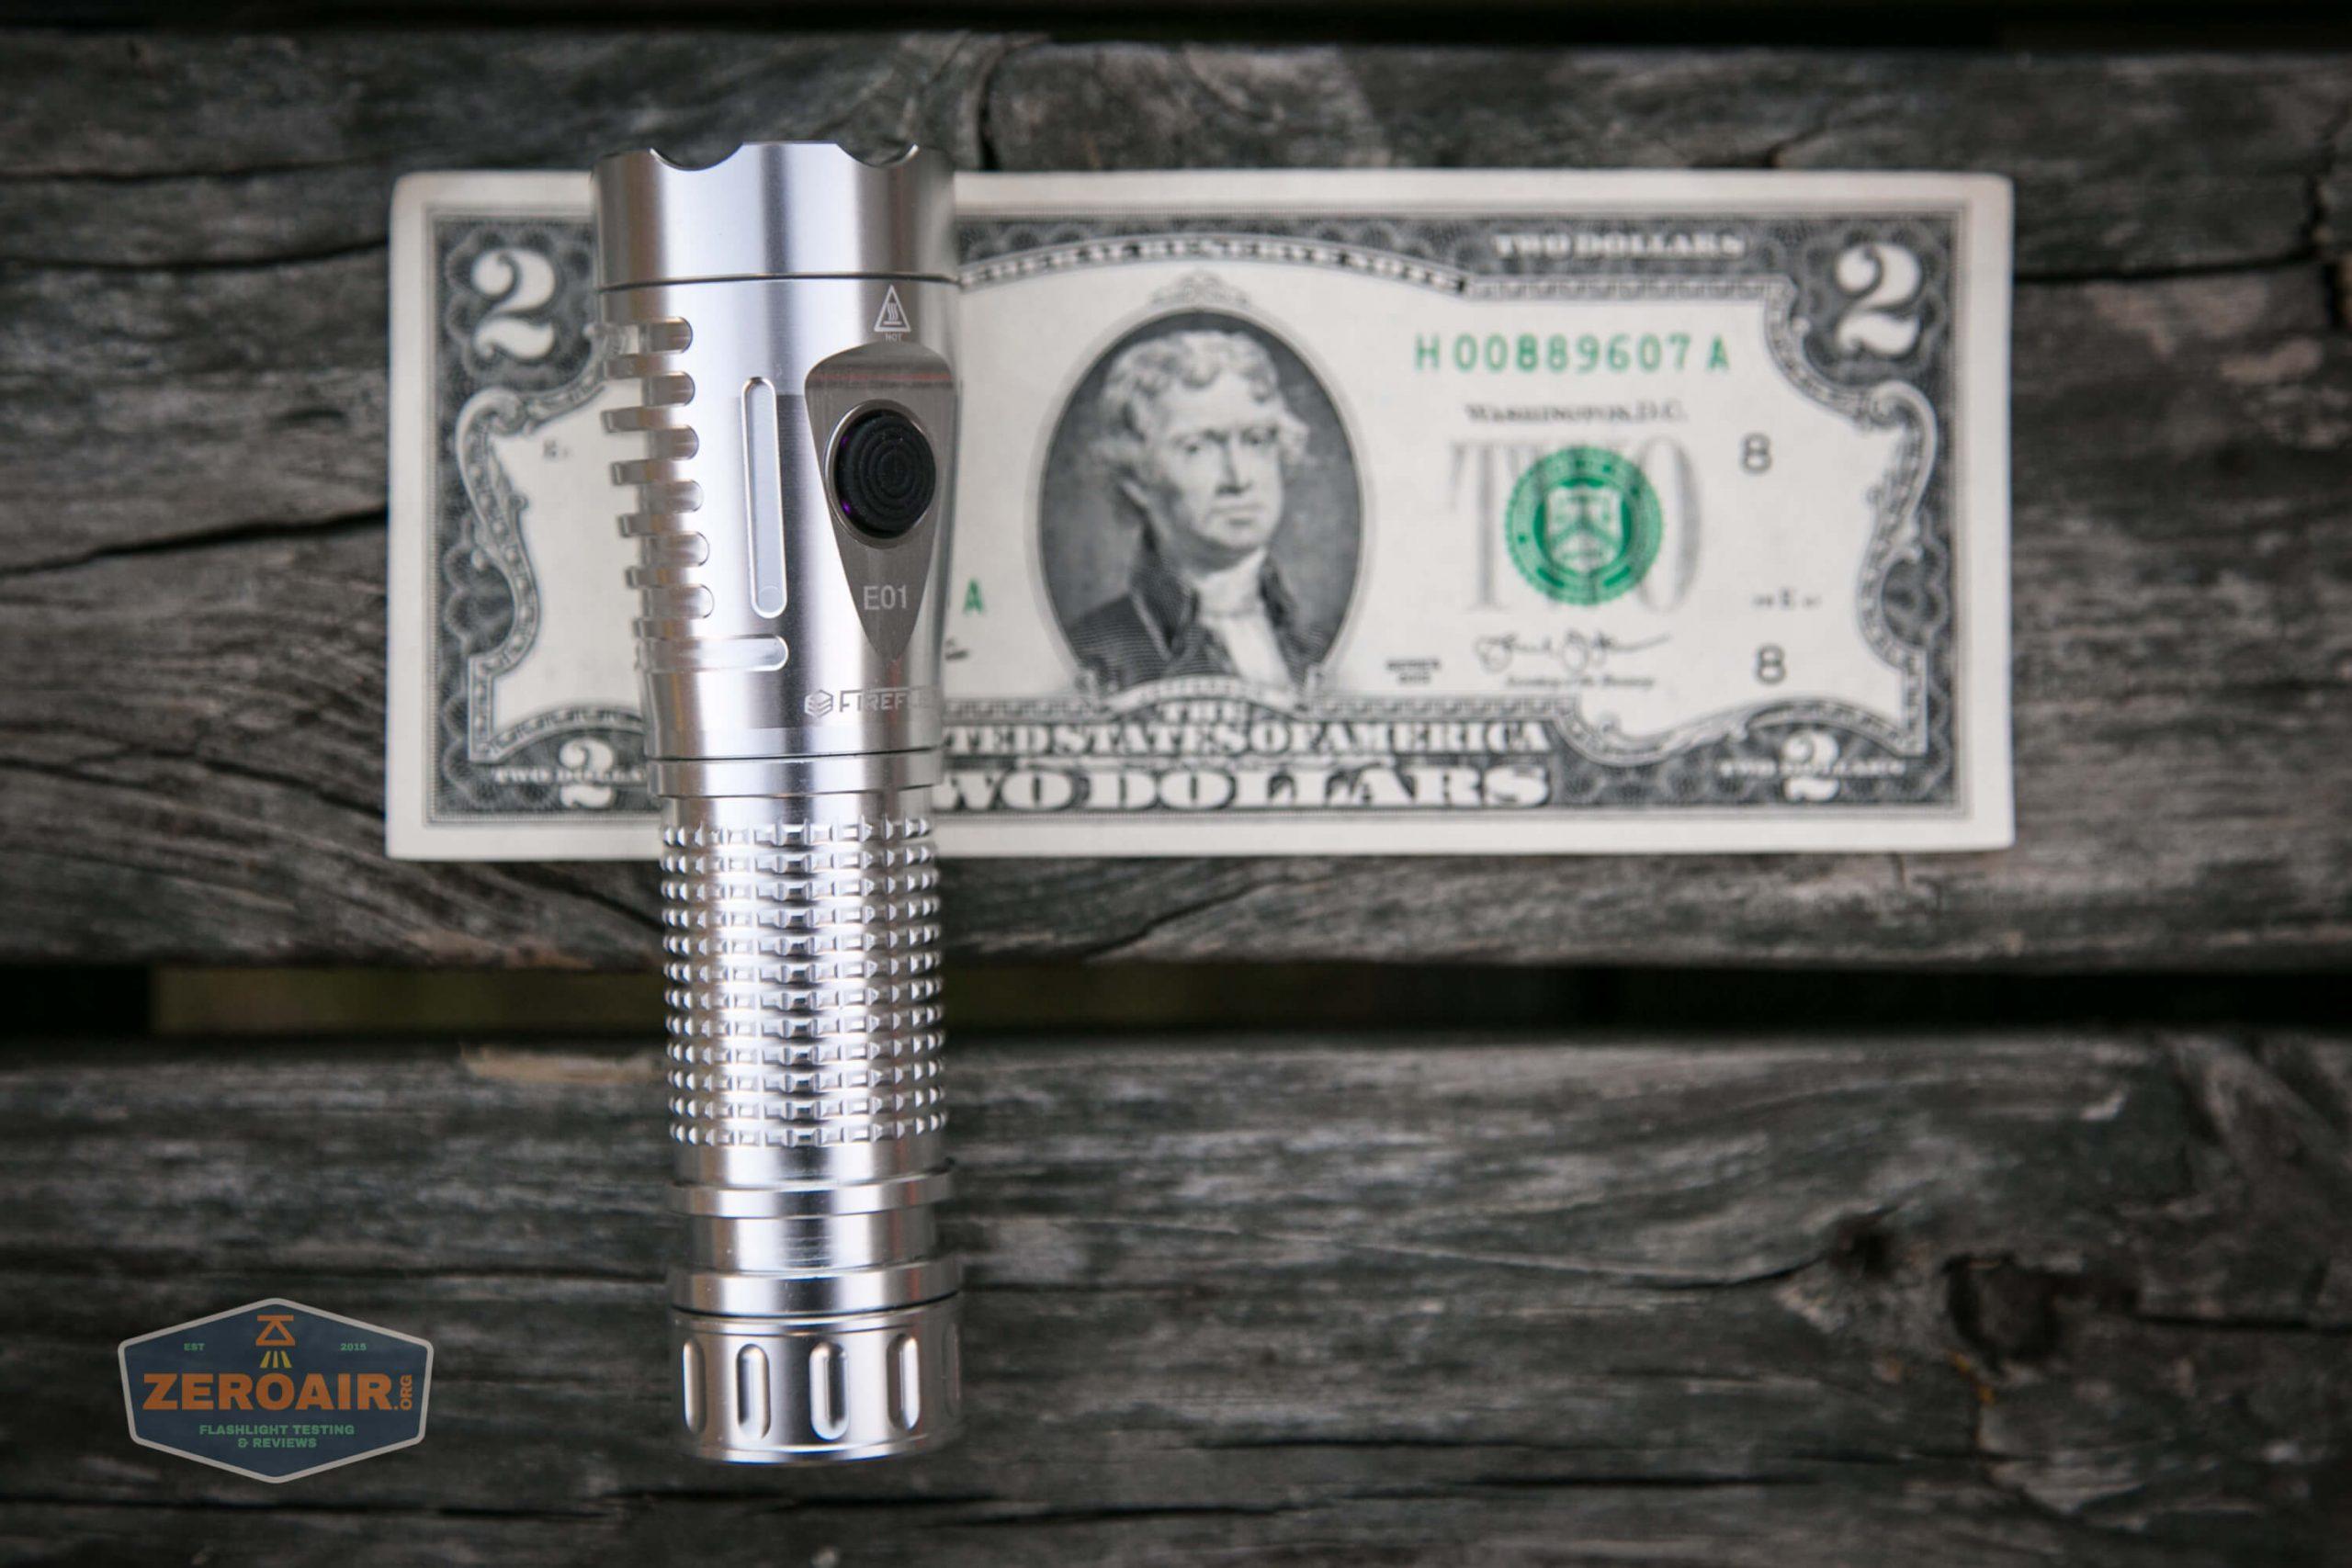 fireflylite e01 luminus sst-40 21700 size on two dollar bill 2